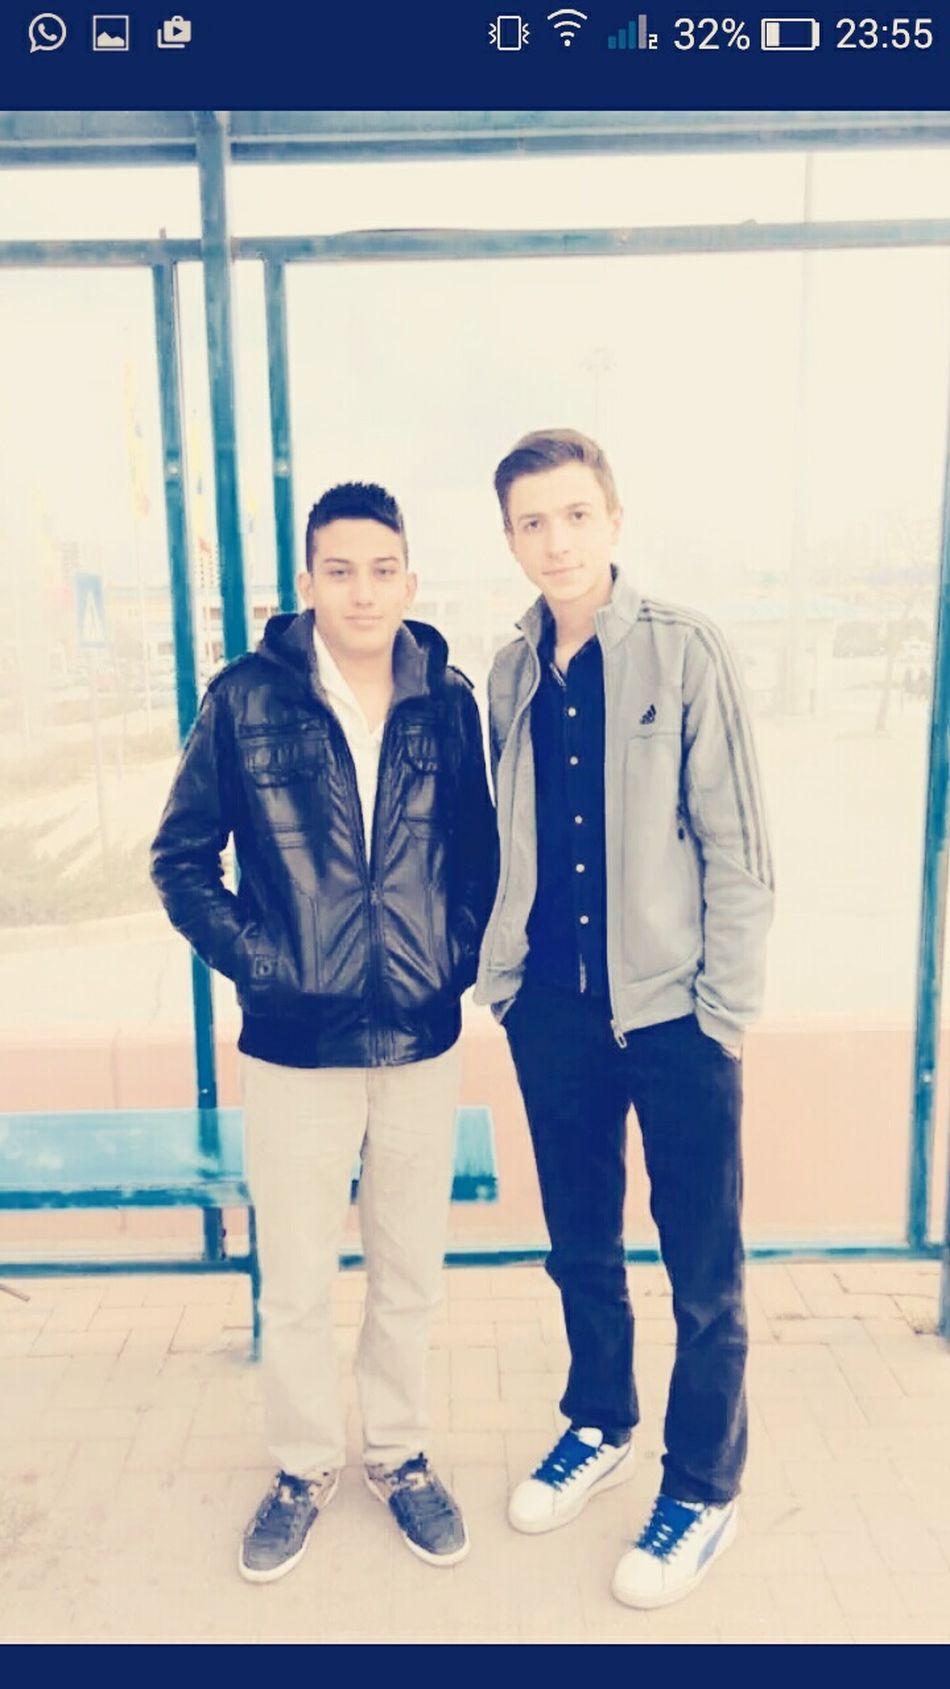 Turkiye ;) Gonya real Jogging